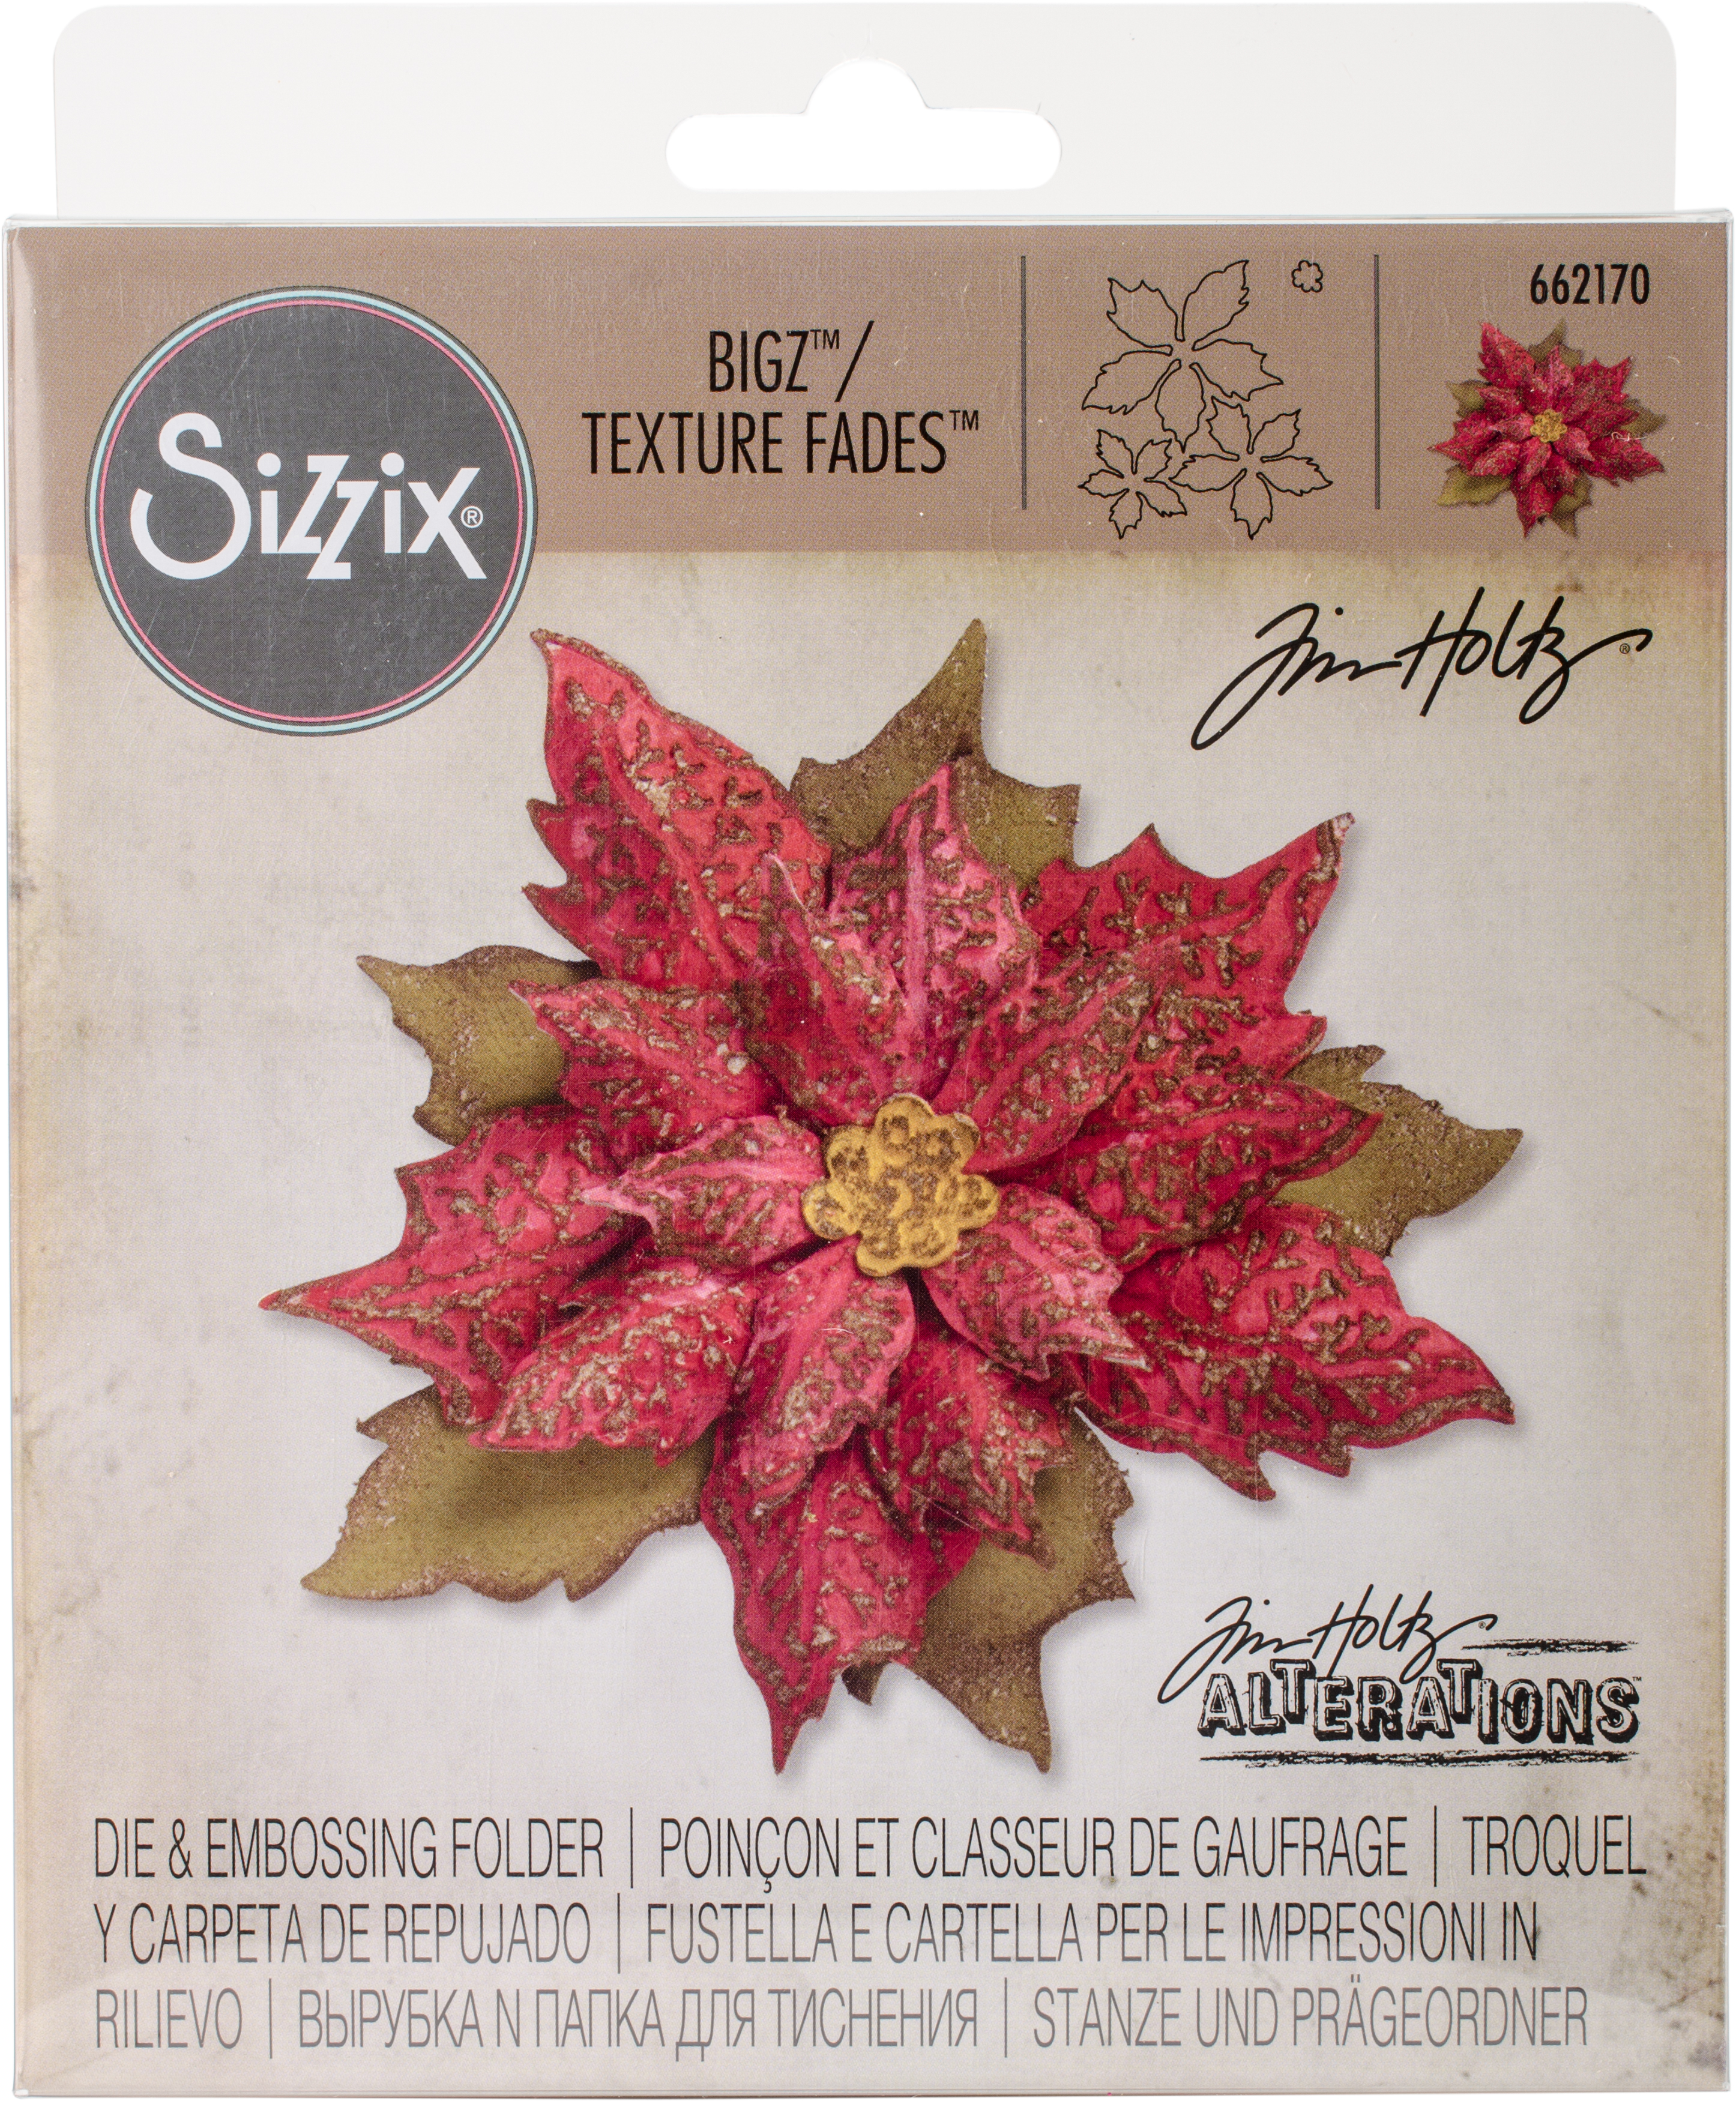 Sizzix Bigz Die W/Texture Fades By Tim Holtz-Layered Tattered Poinsettia 2.75X6.625